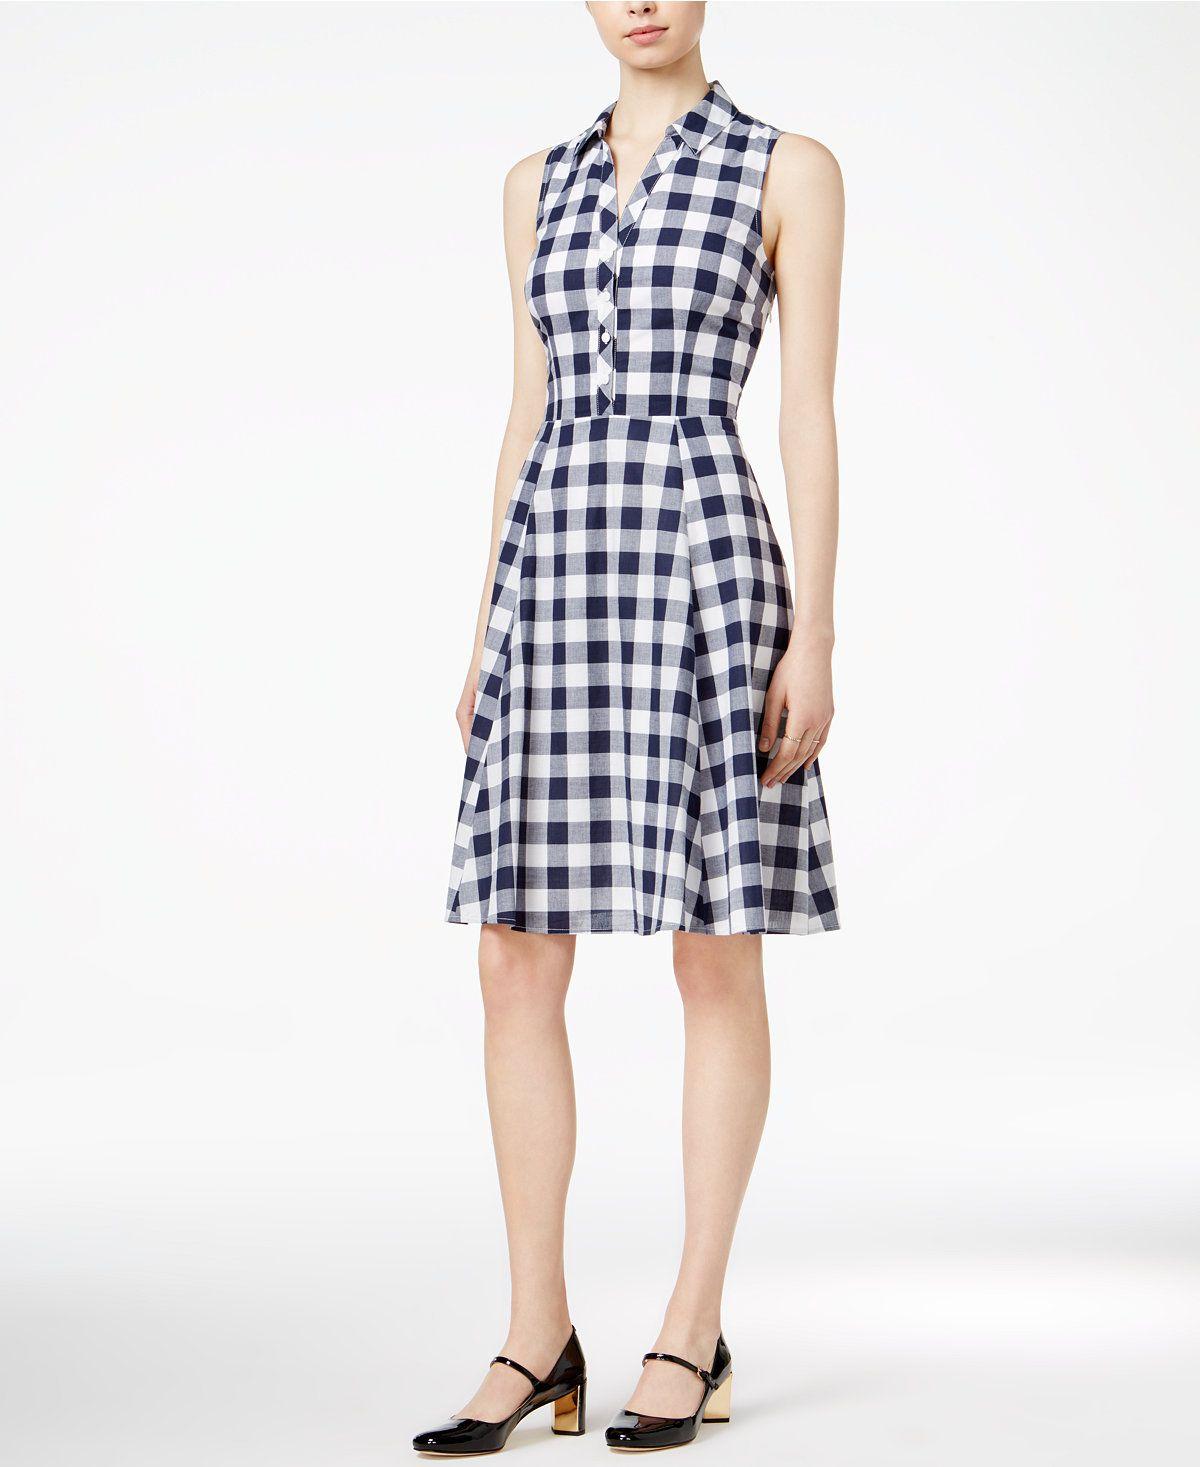 Maison Jules Cotton Gingham Shirtdress, Only at Macy's - Maison Jules - Women - Macy's